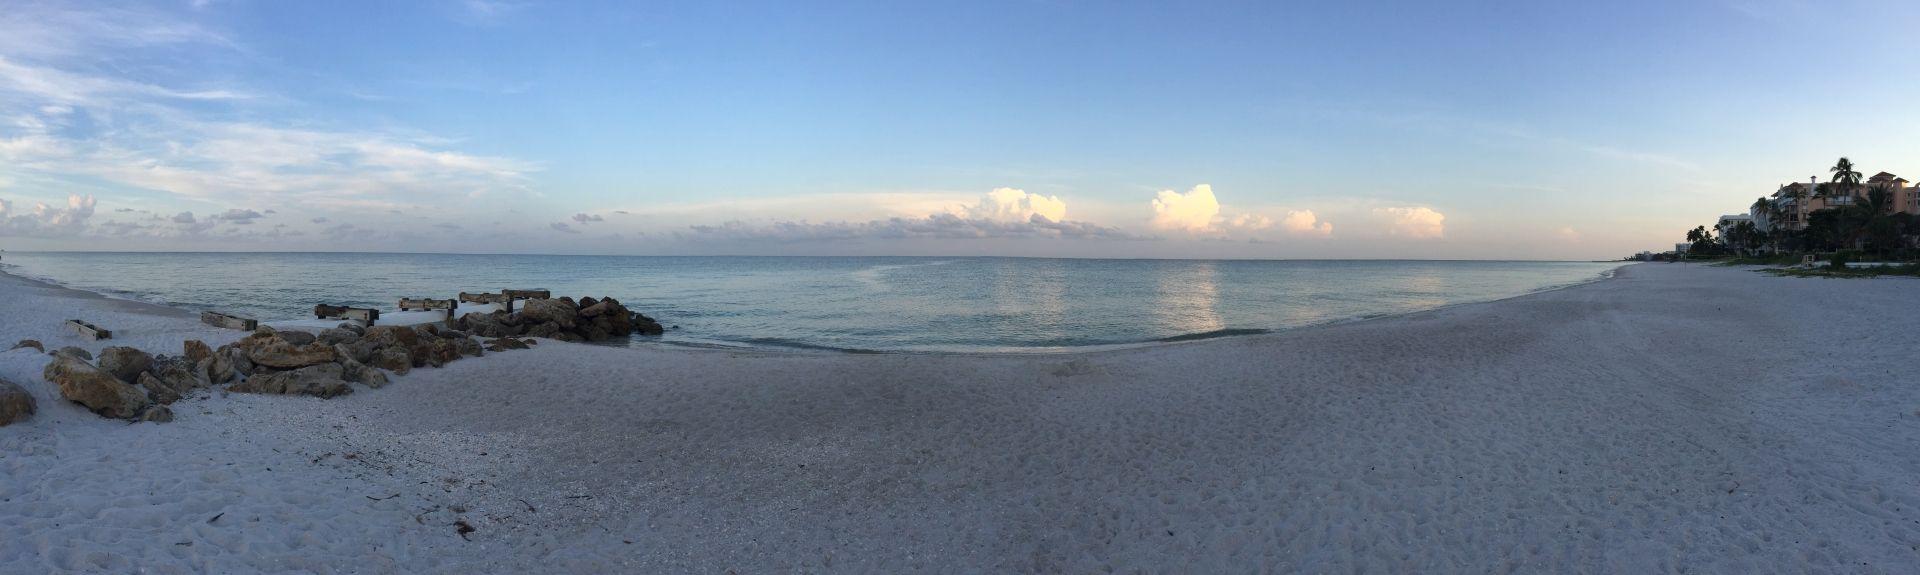 hight resolution of beautiful beach sunrise in naples fl